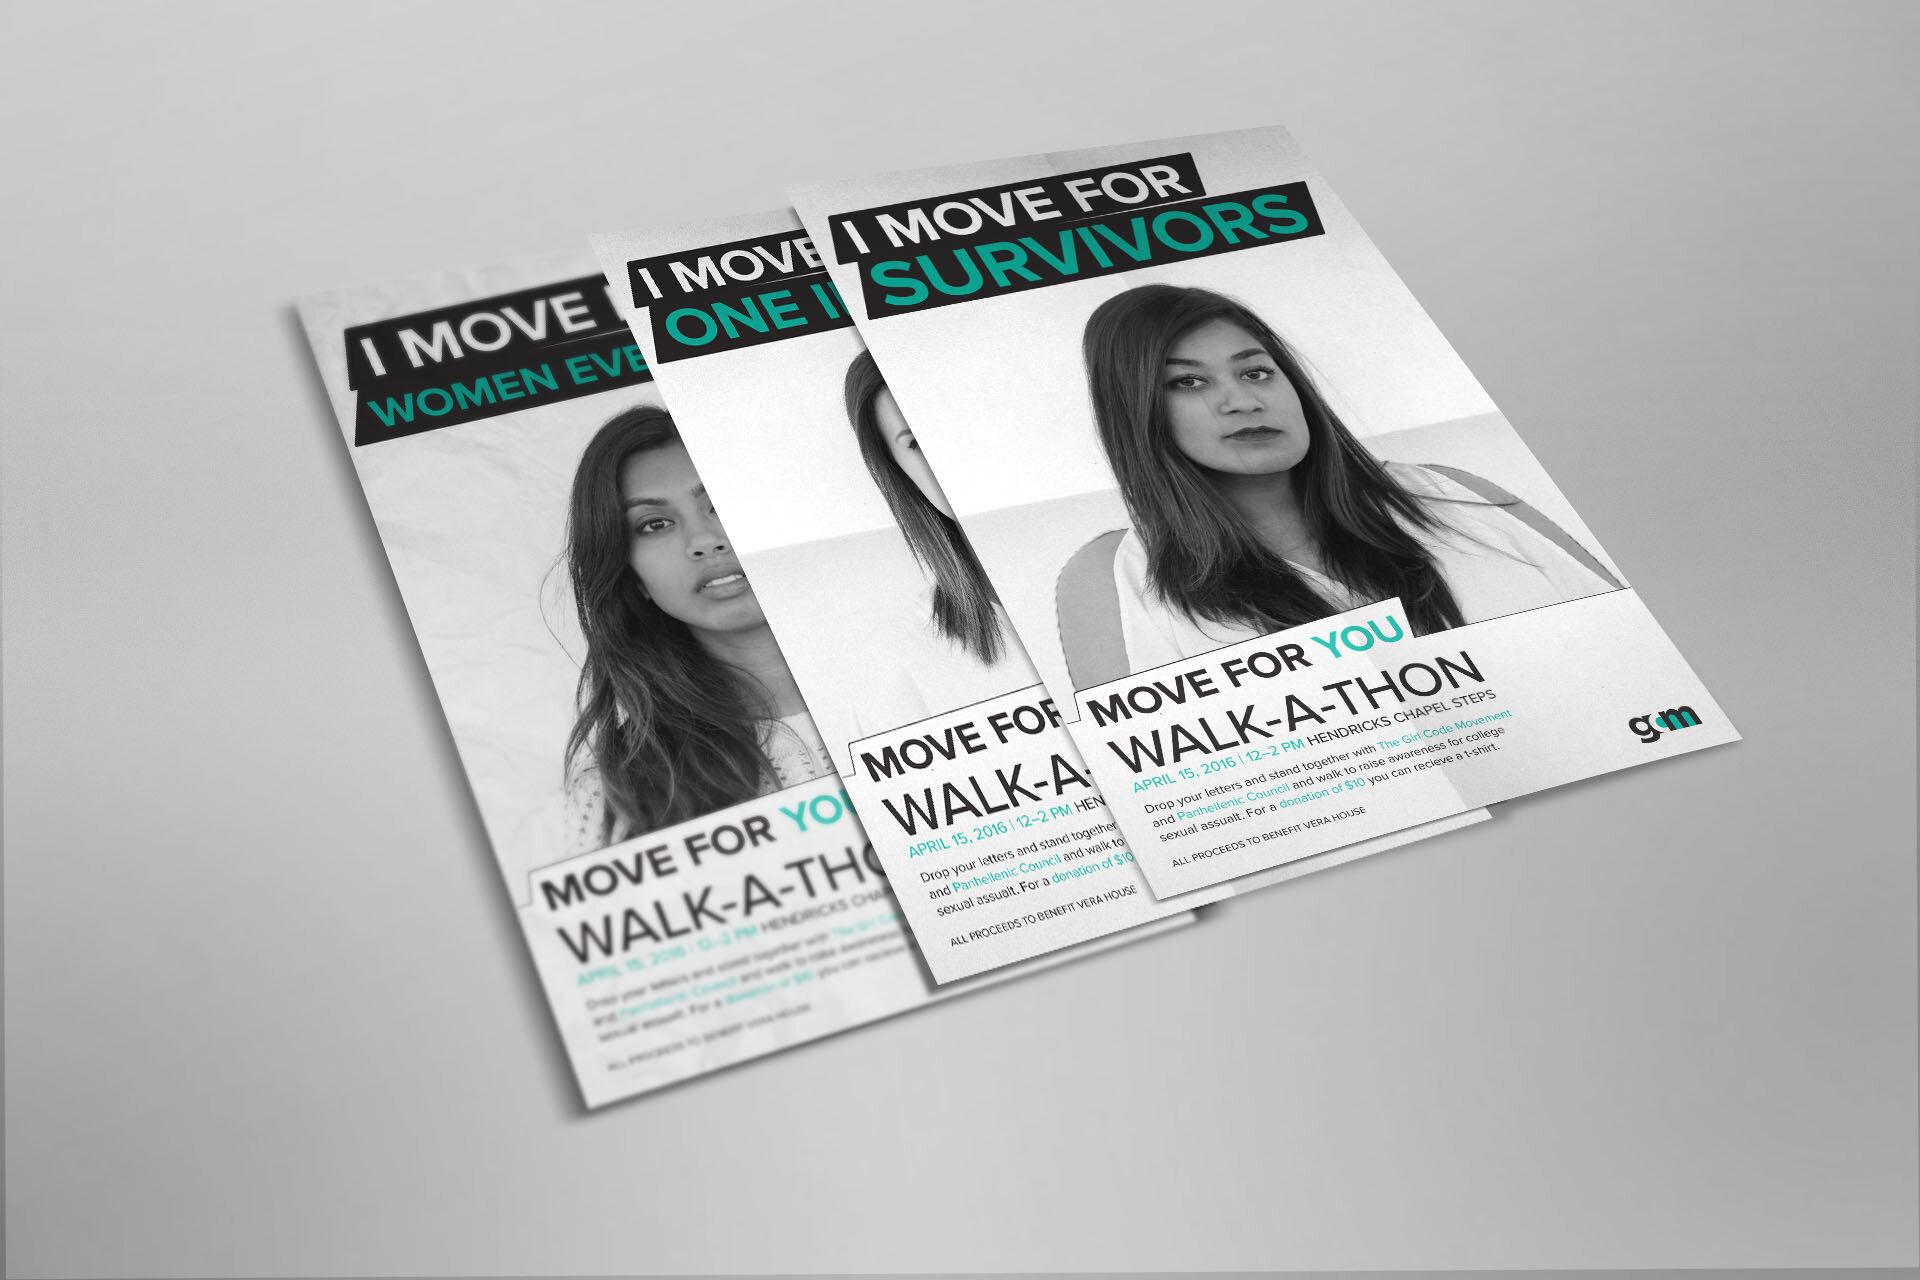 Flyer Poster Mockup 01 - originalmockups.com.jpg